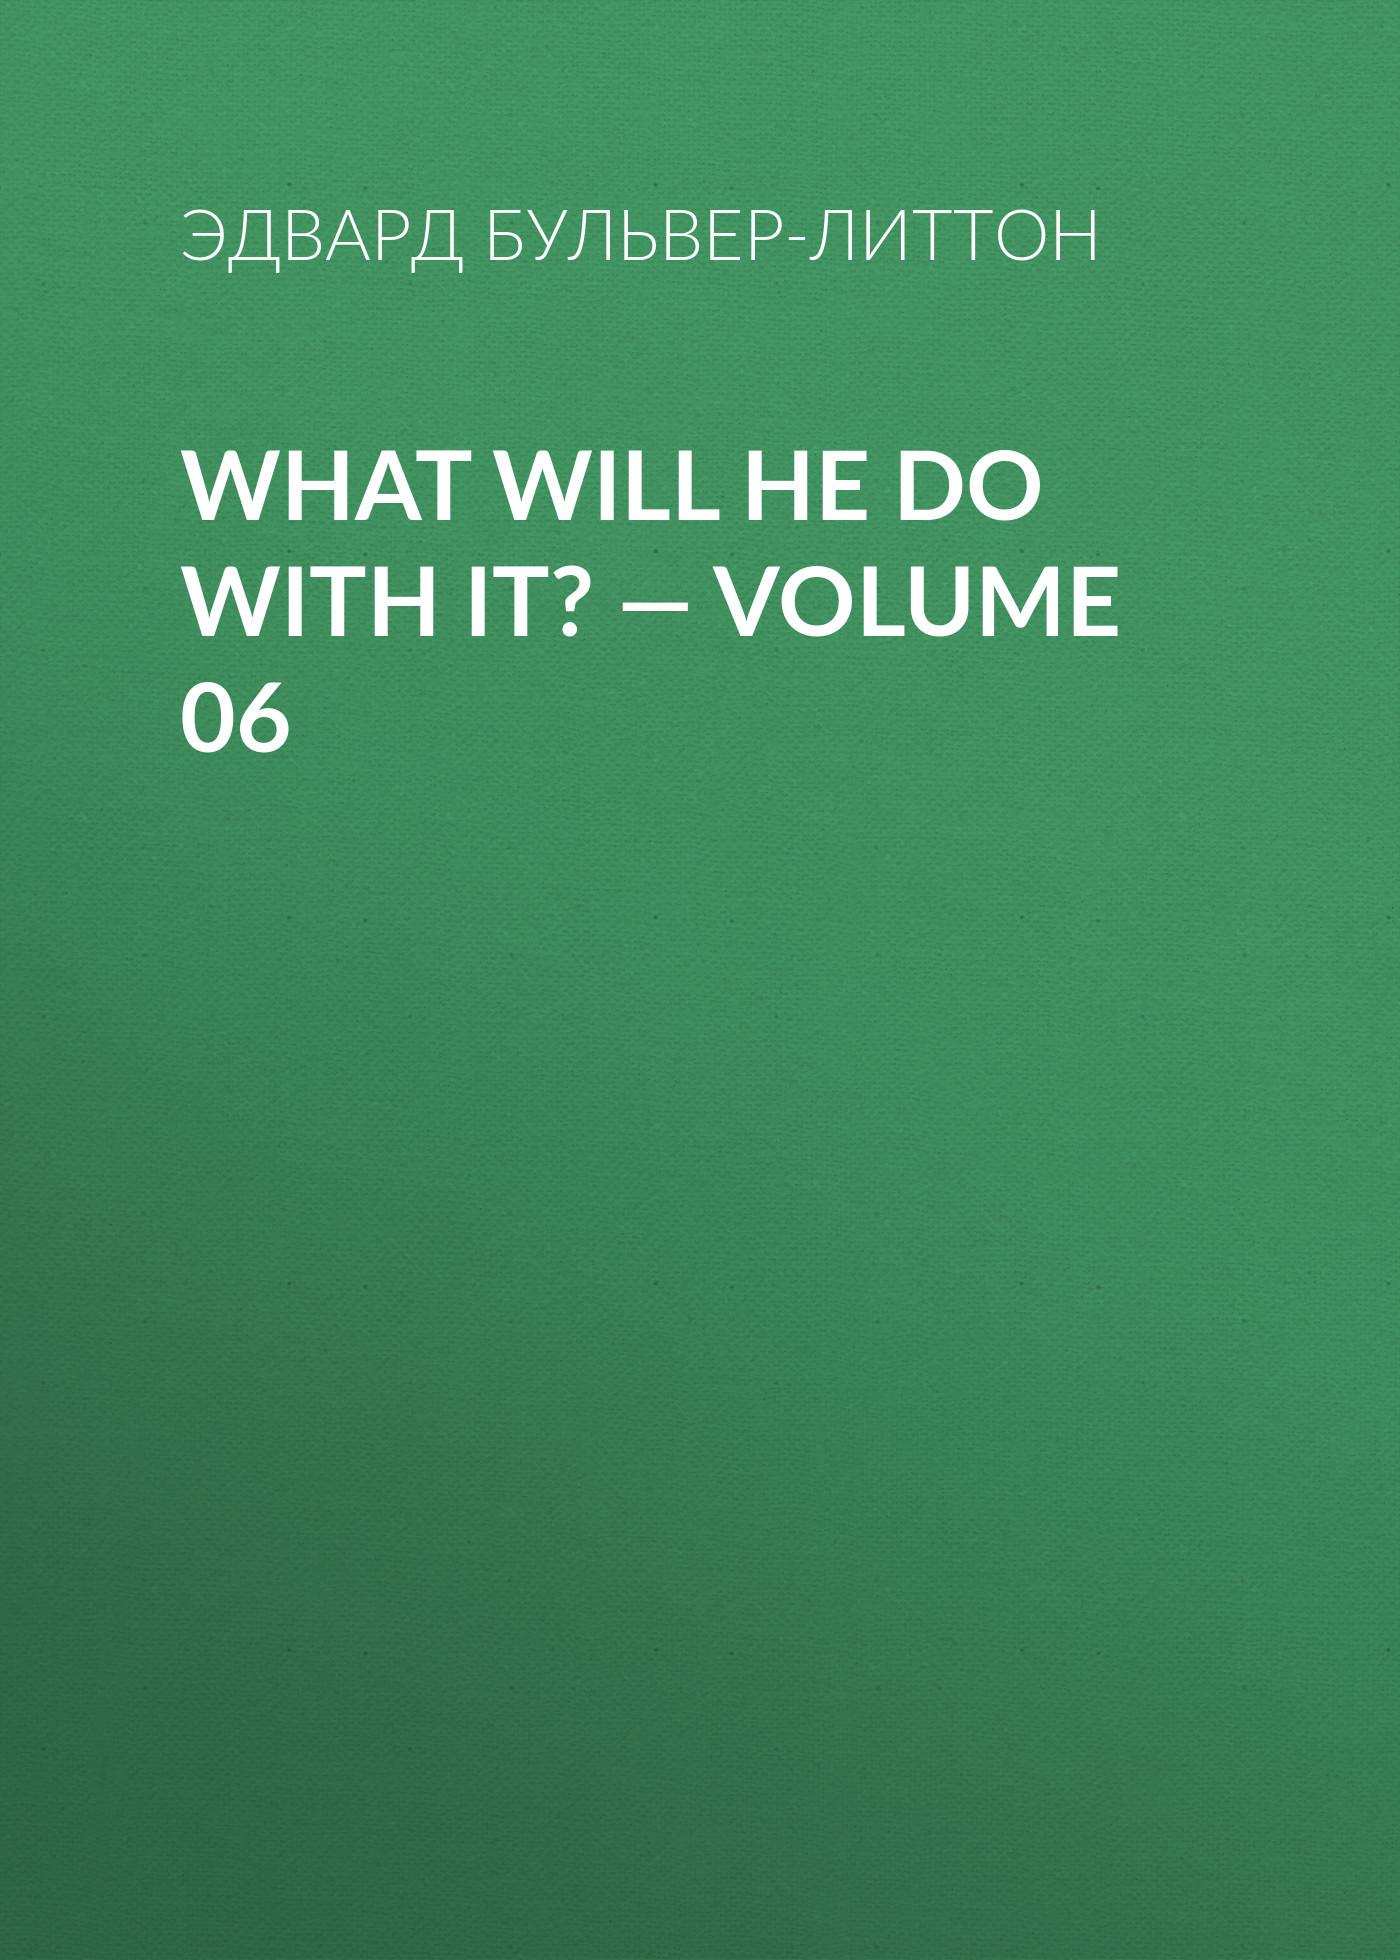 Эдвард Бульвер-Литтон What Will He Do with It? — Volume 06 mk8 aluminum extruder kit with nema 17 stepper motor 1 75mm for 3d printer reprap prusa i3